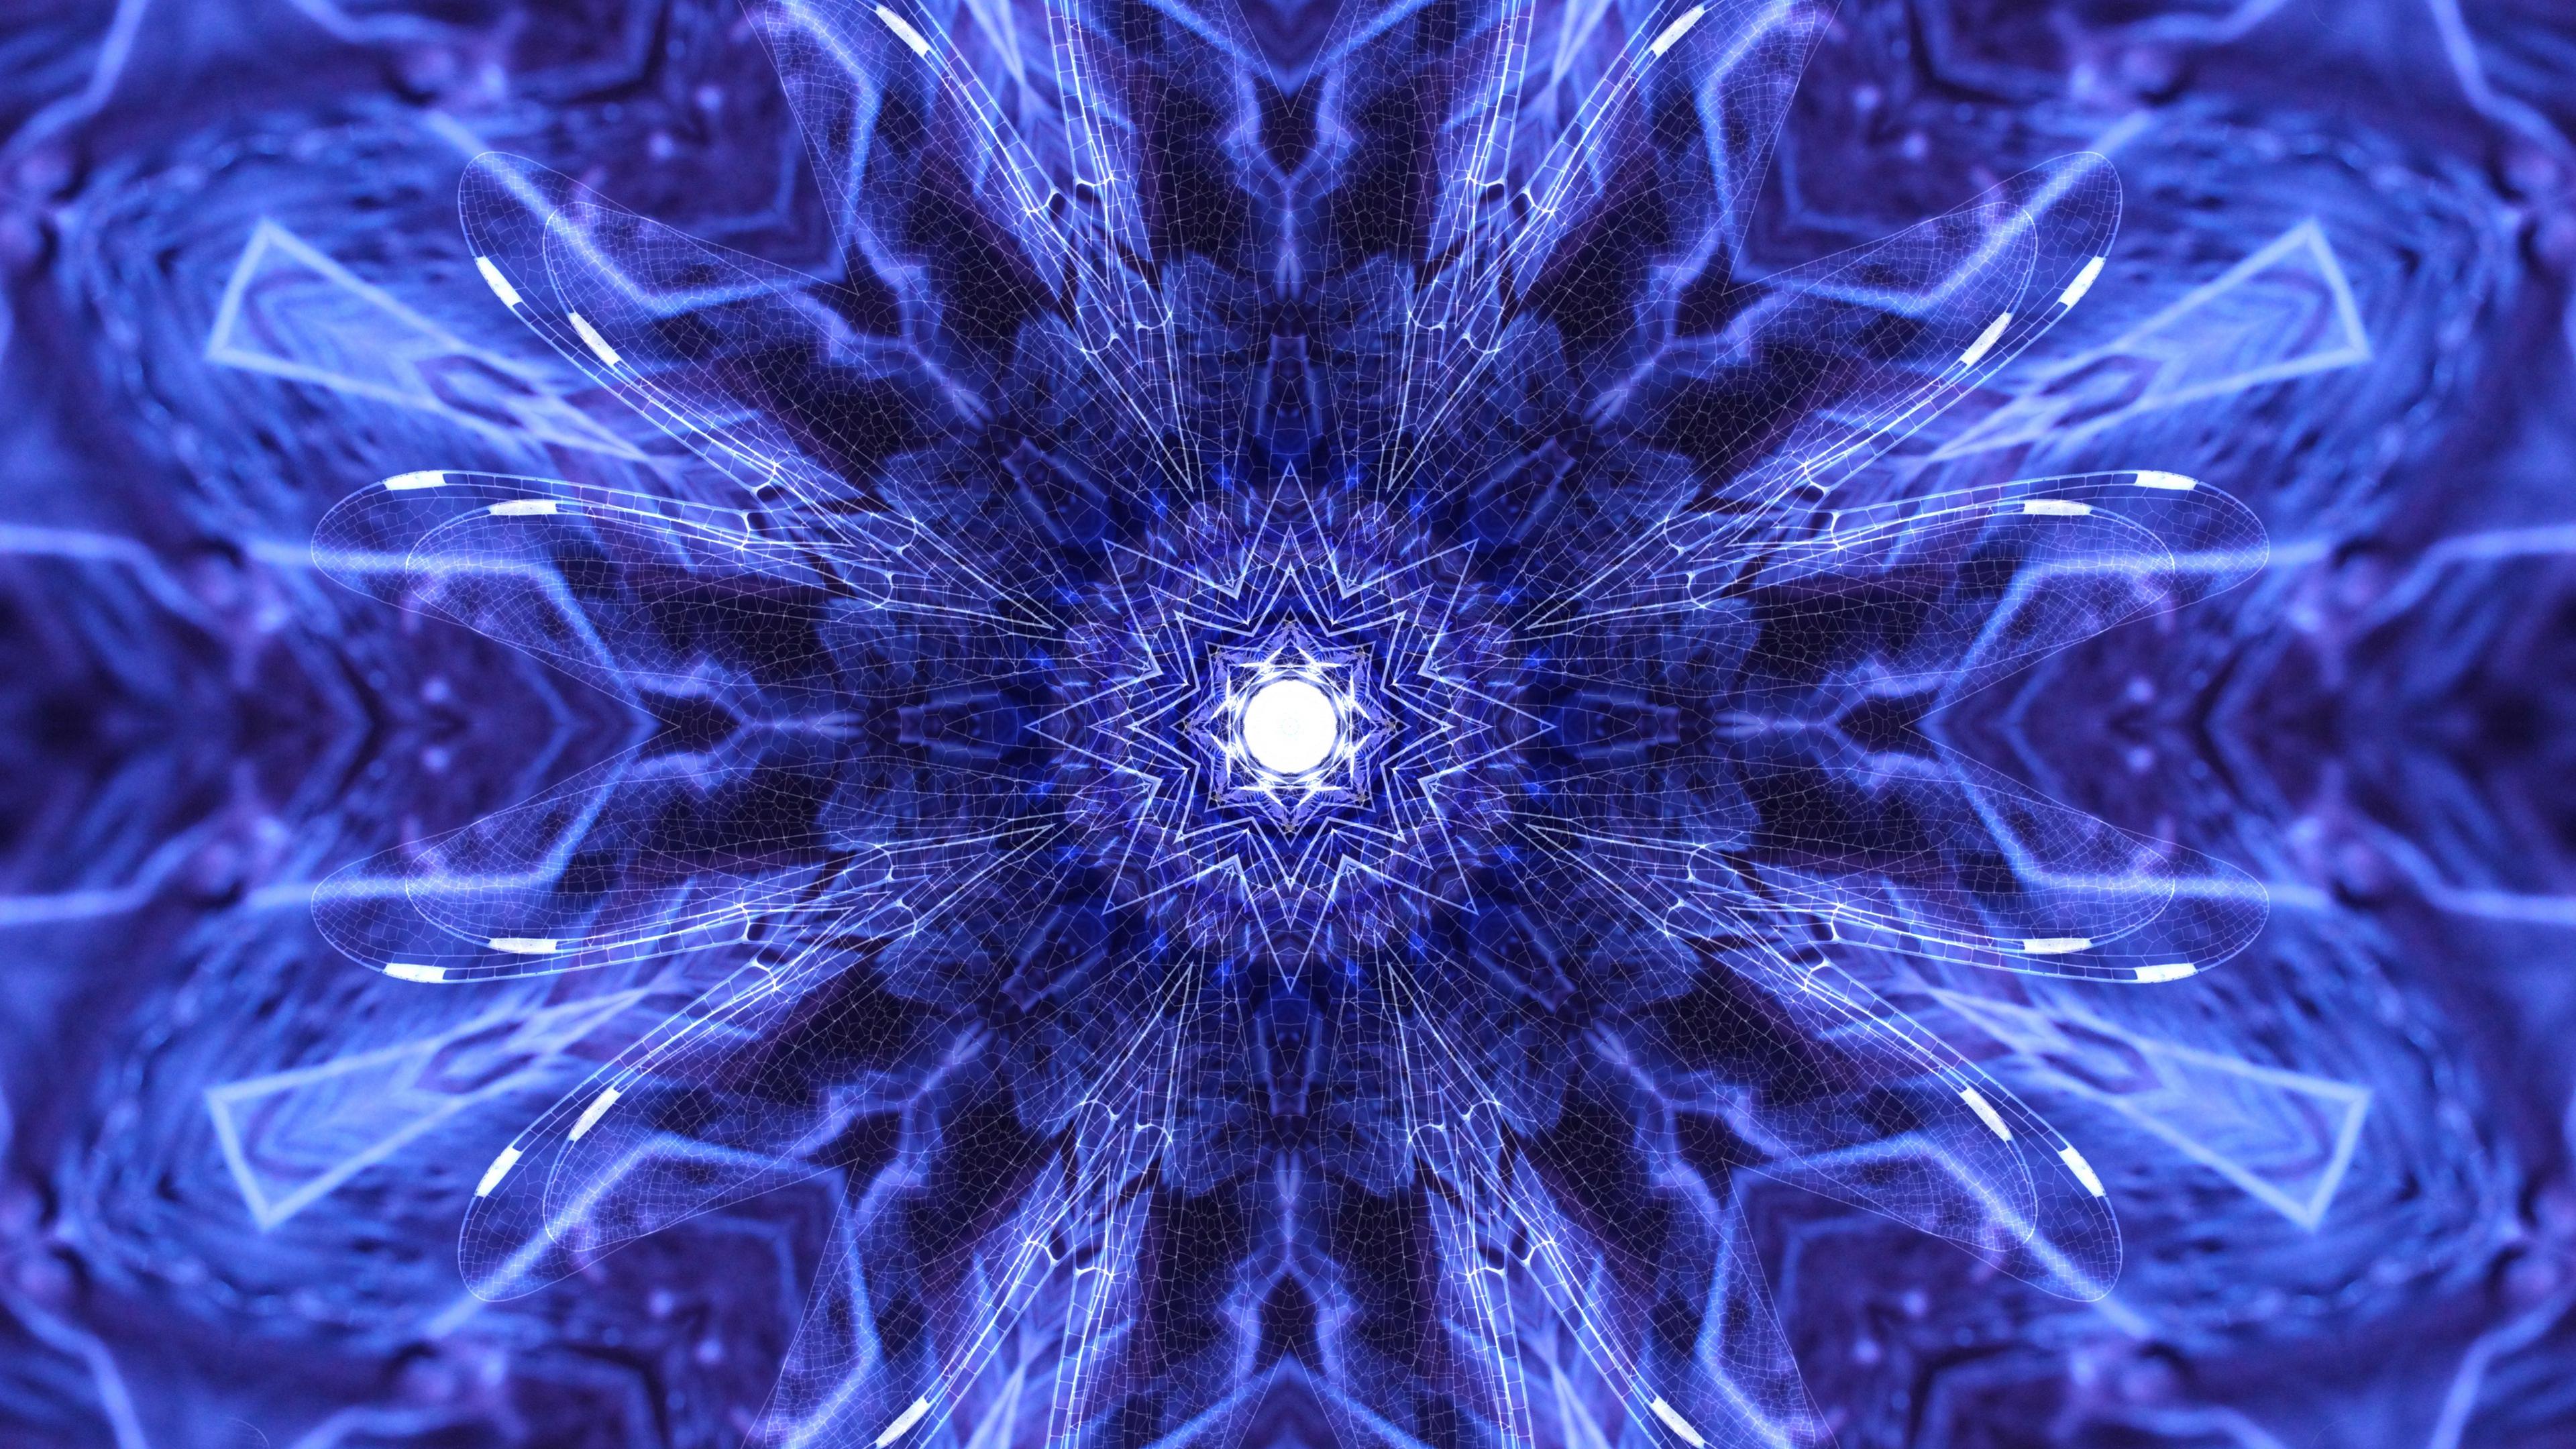 patterns lilac fractal plexus geometric 4k 1539370244 - patterns, lilac, fractal, plexus, geometric 4k - patterns, Lilac, Fractal